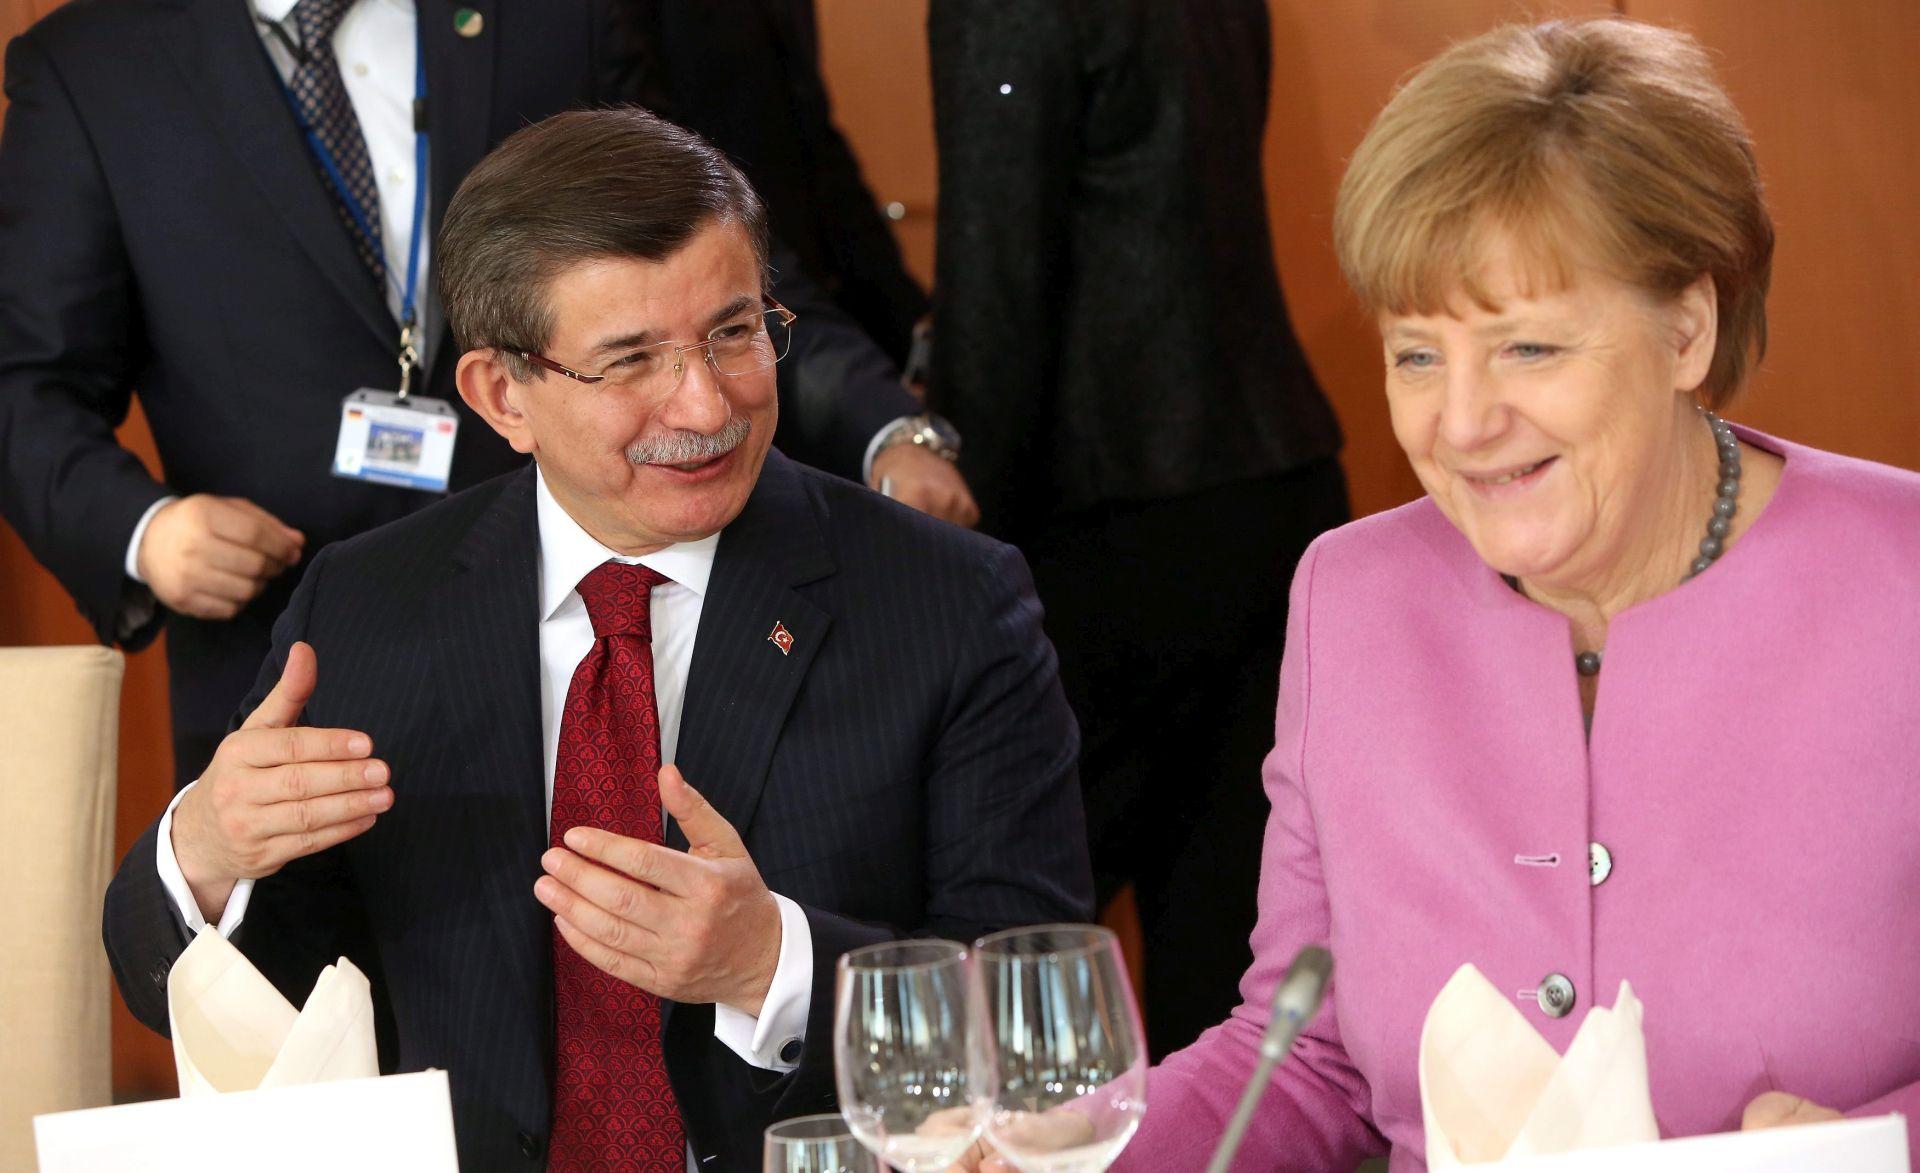 Njemačka i Turska dogovorile suradnju u rješavanju migrantske krize